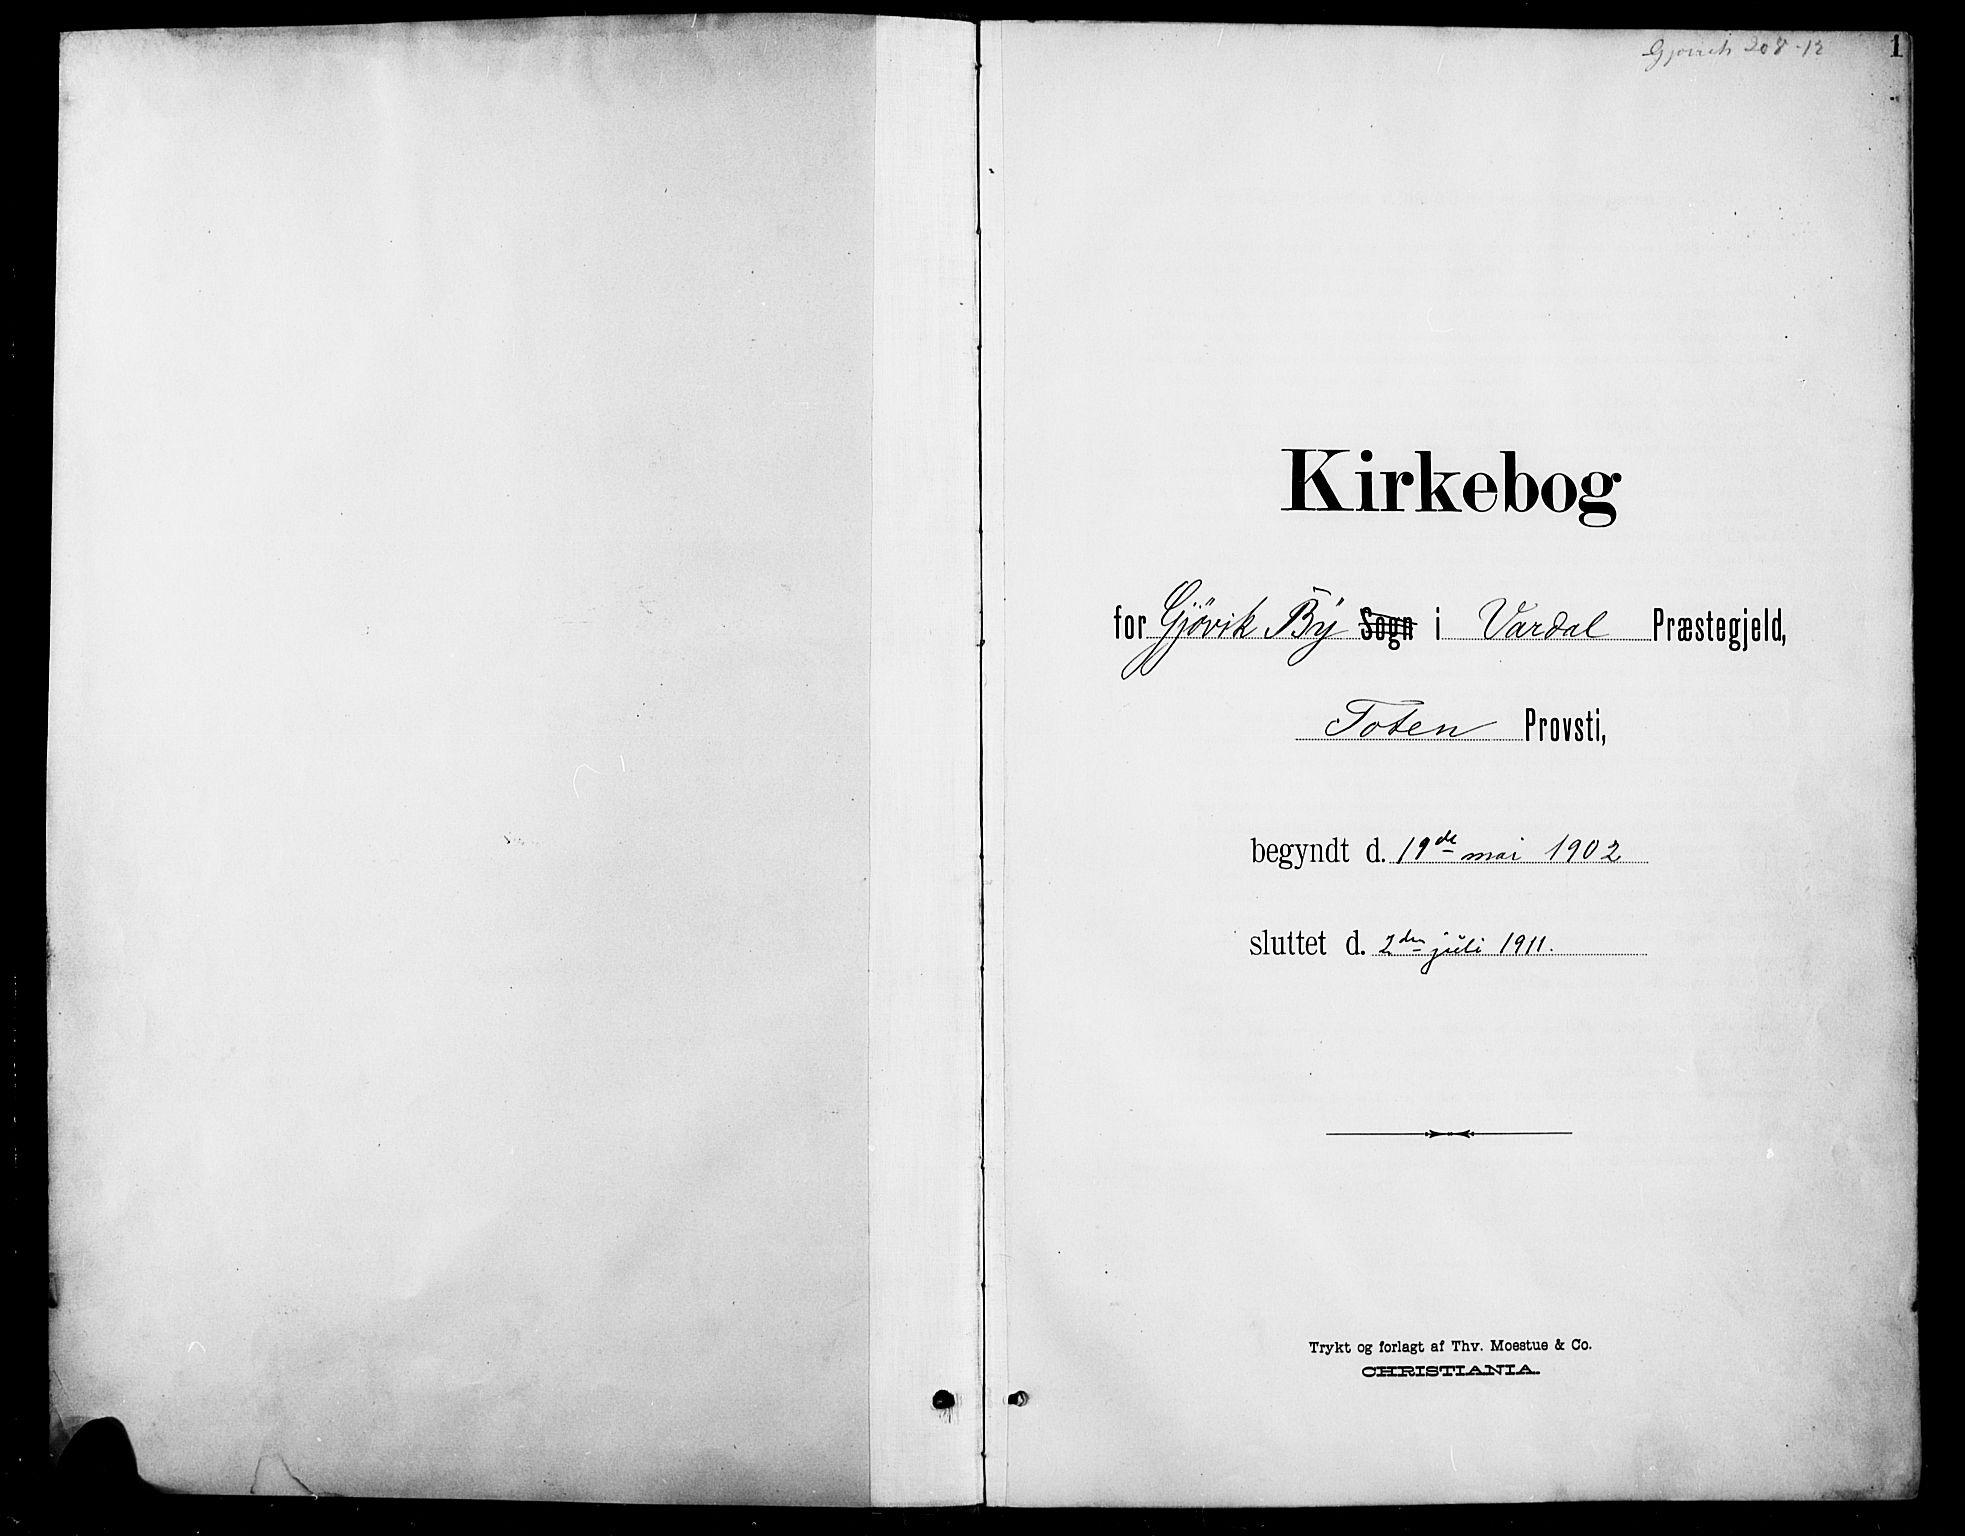 SAH, Vardal prestekontor, H/Ha/Hab/L0012: Klokkerbok nr. 12, 1902-1911, s. 1